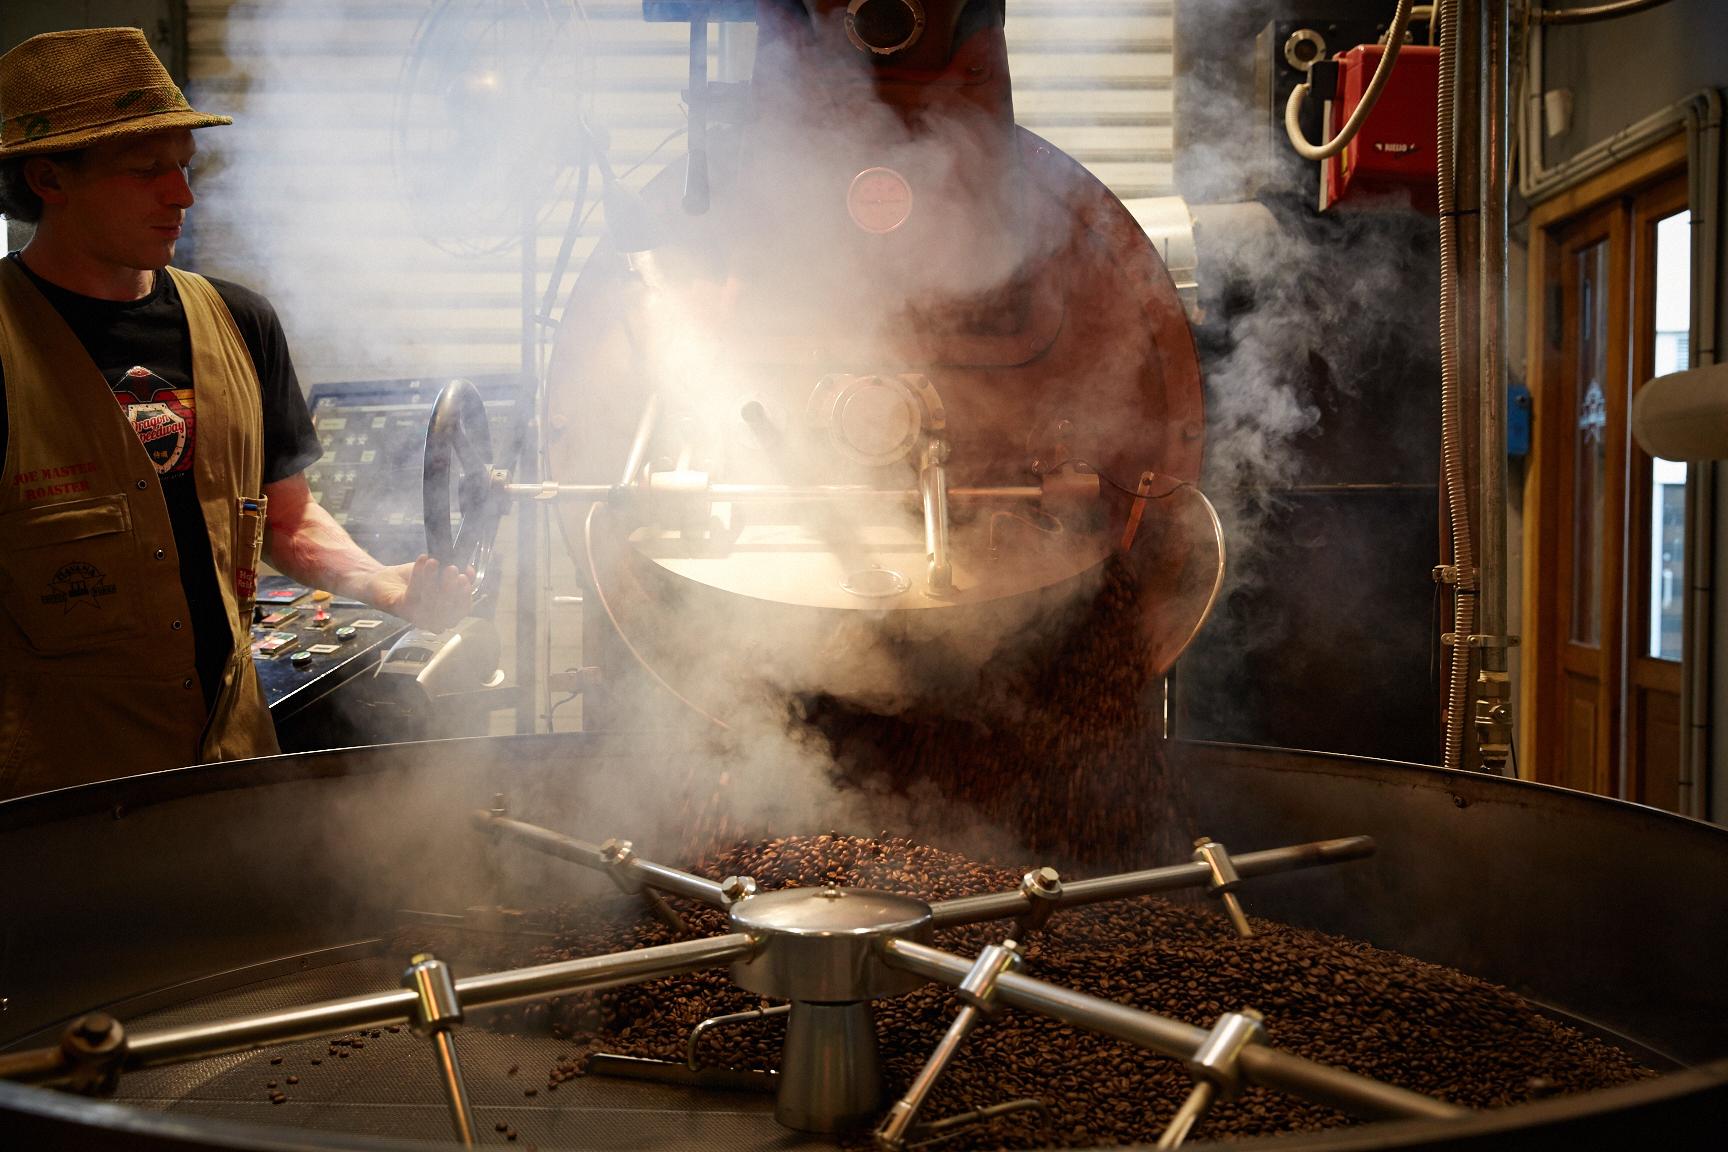 Roastery-roasting beans2.jpg